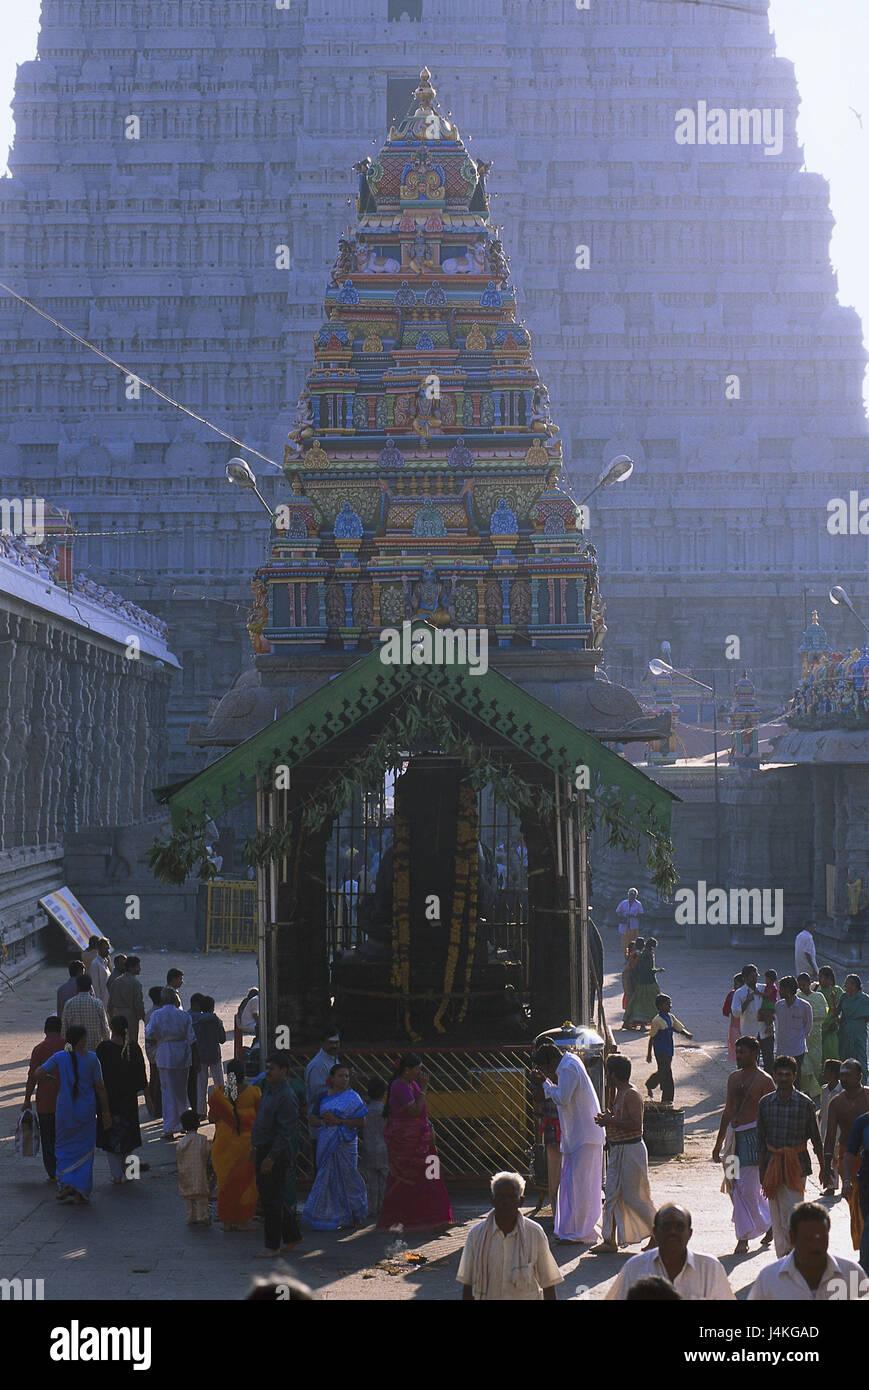 India, Tamil Nadu, Tiruvannamalai temple, pagoda, religious Asia, South Asia, Hindi Bharat, Südindien, faith, - Stock Image